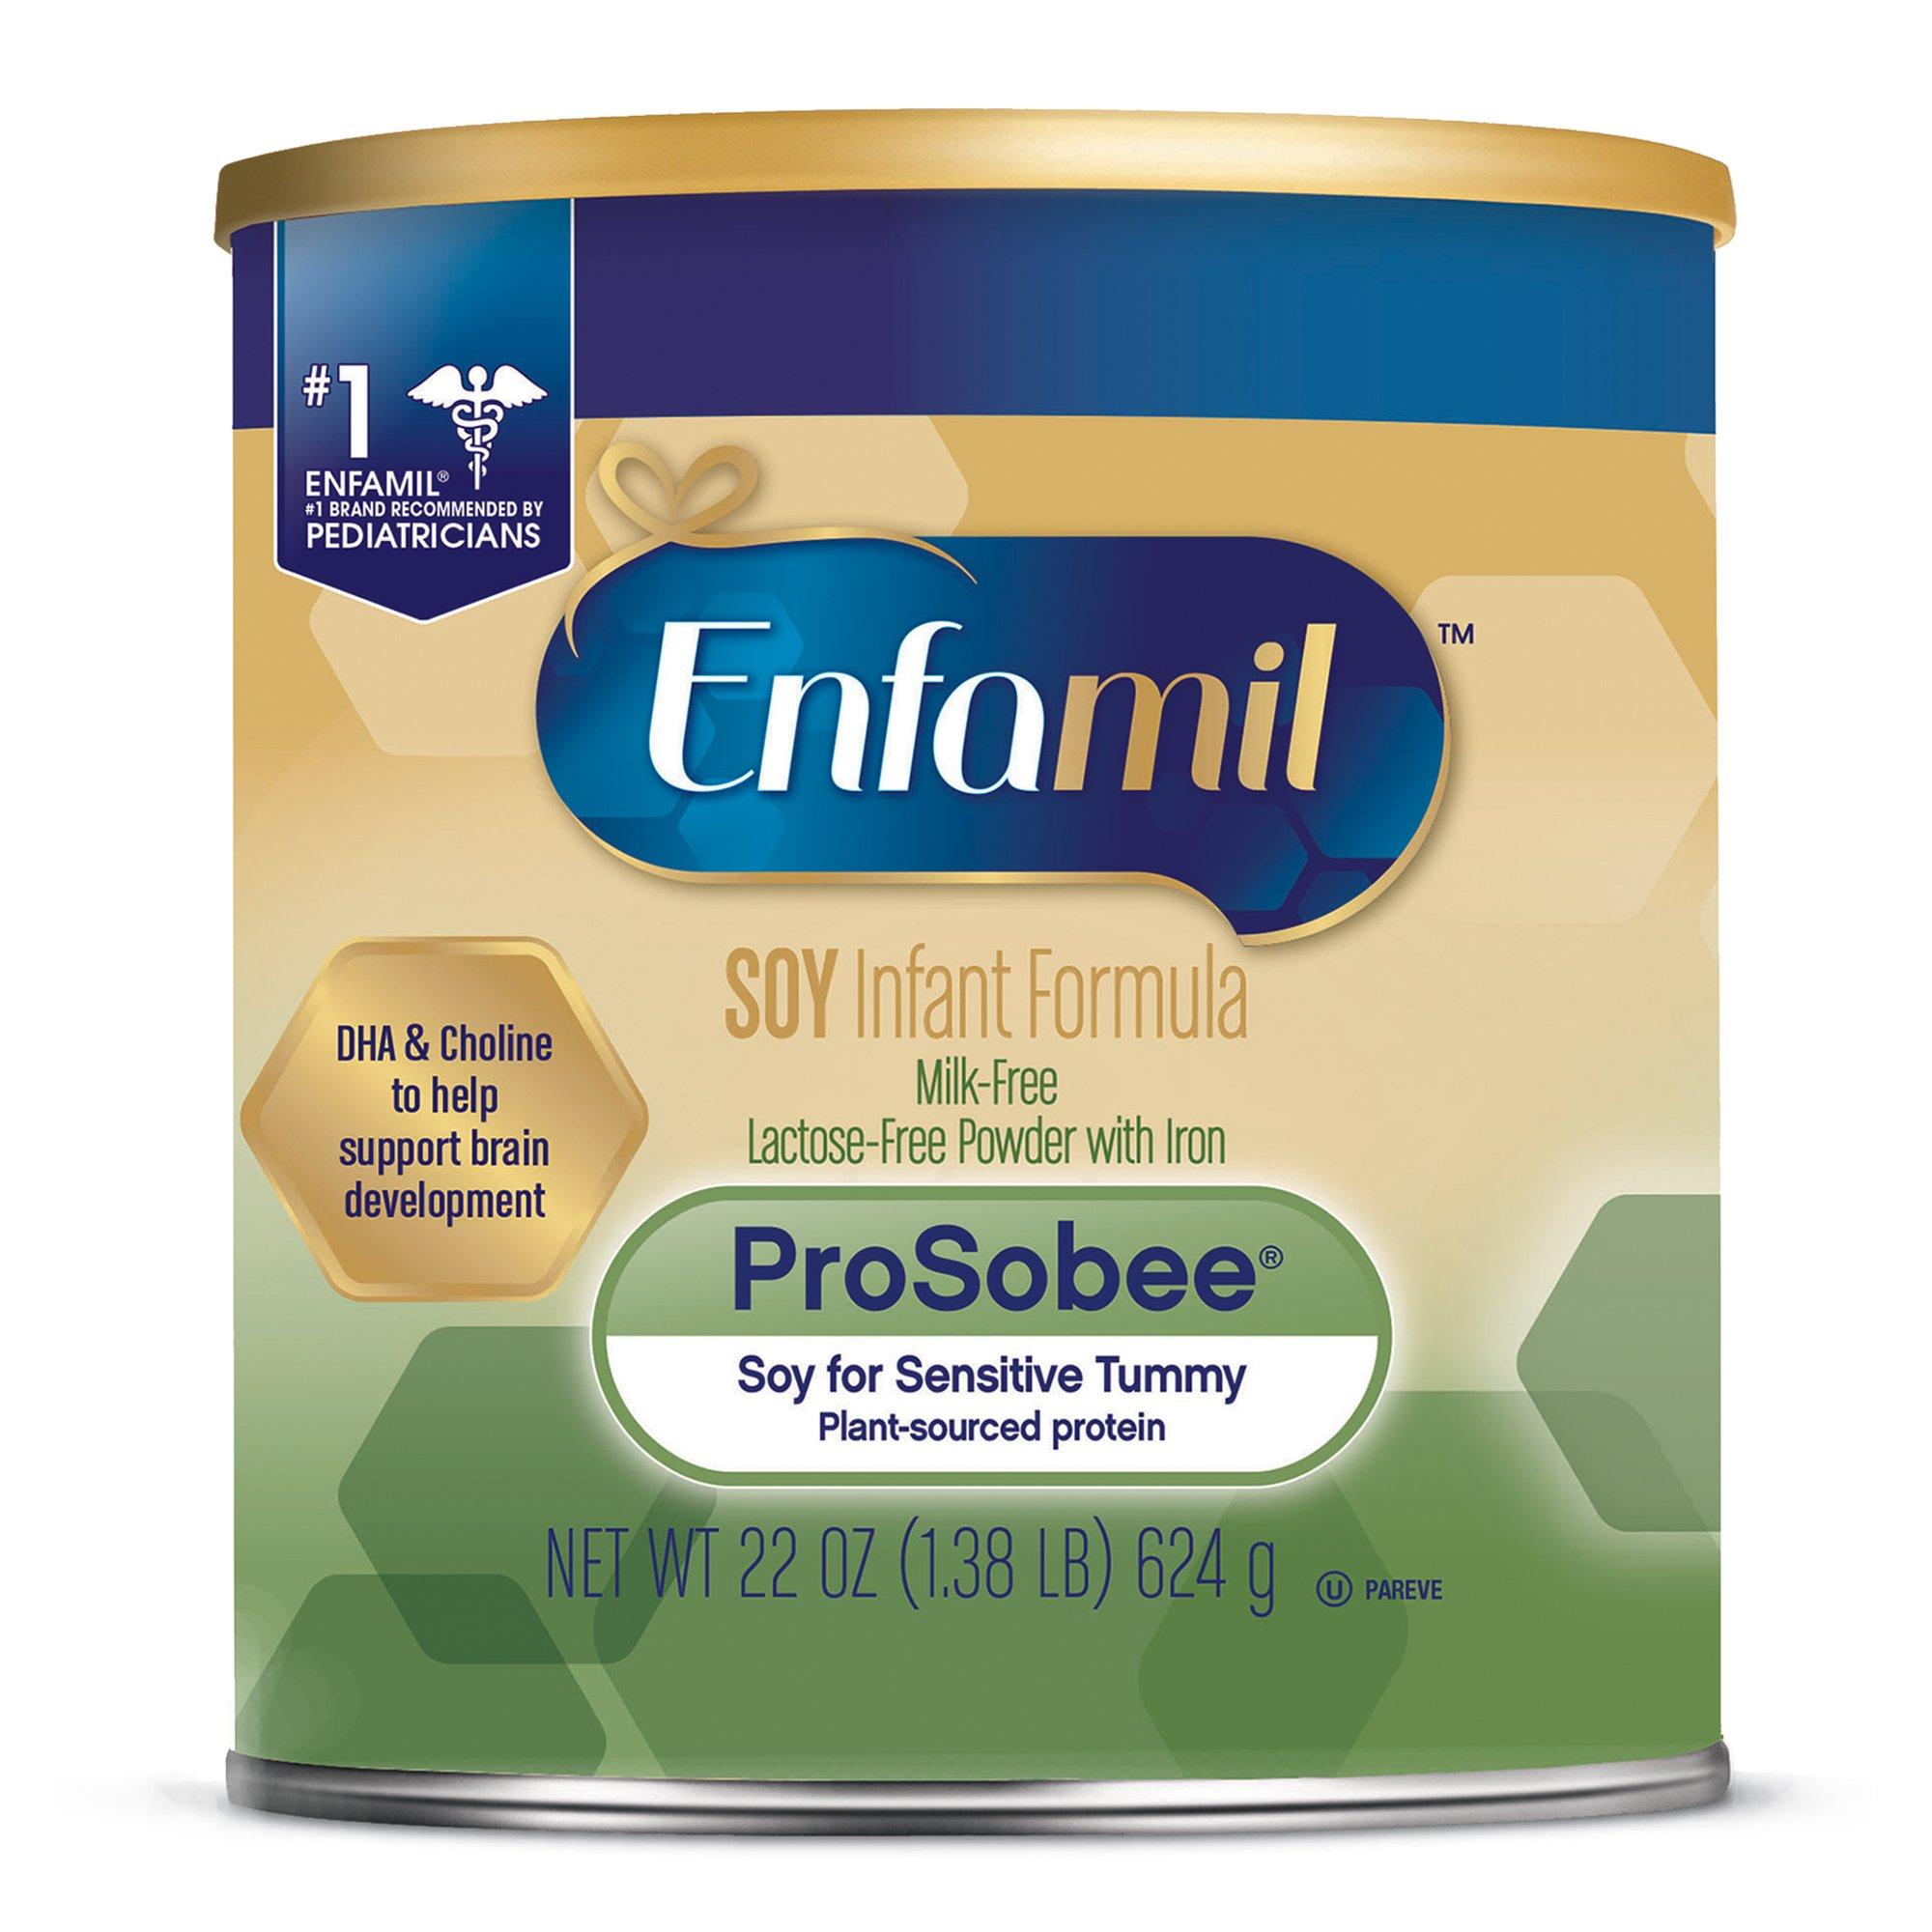 Enfamil ProSobee Soy-Based Infant Formula - Lactose Free for Sensitive Tummies - Powder Can, 22 oz